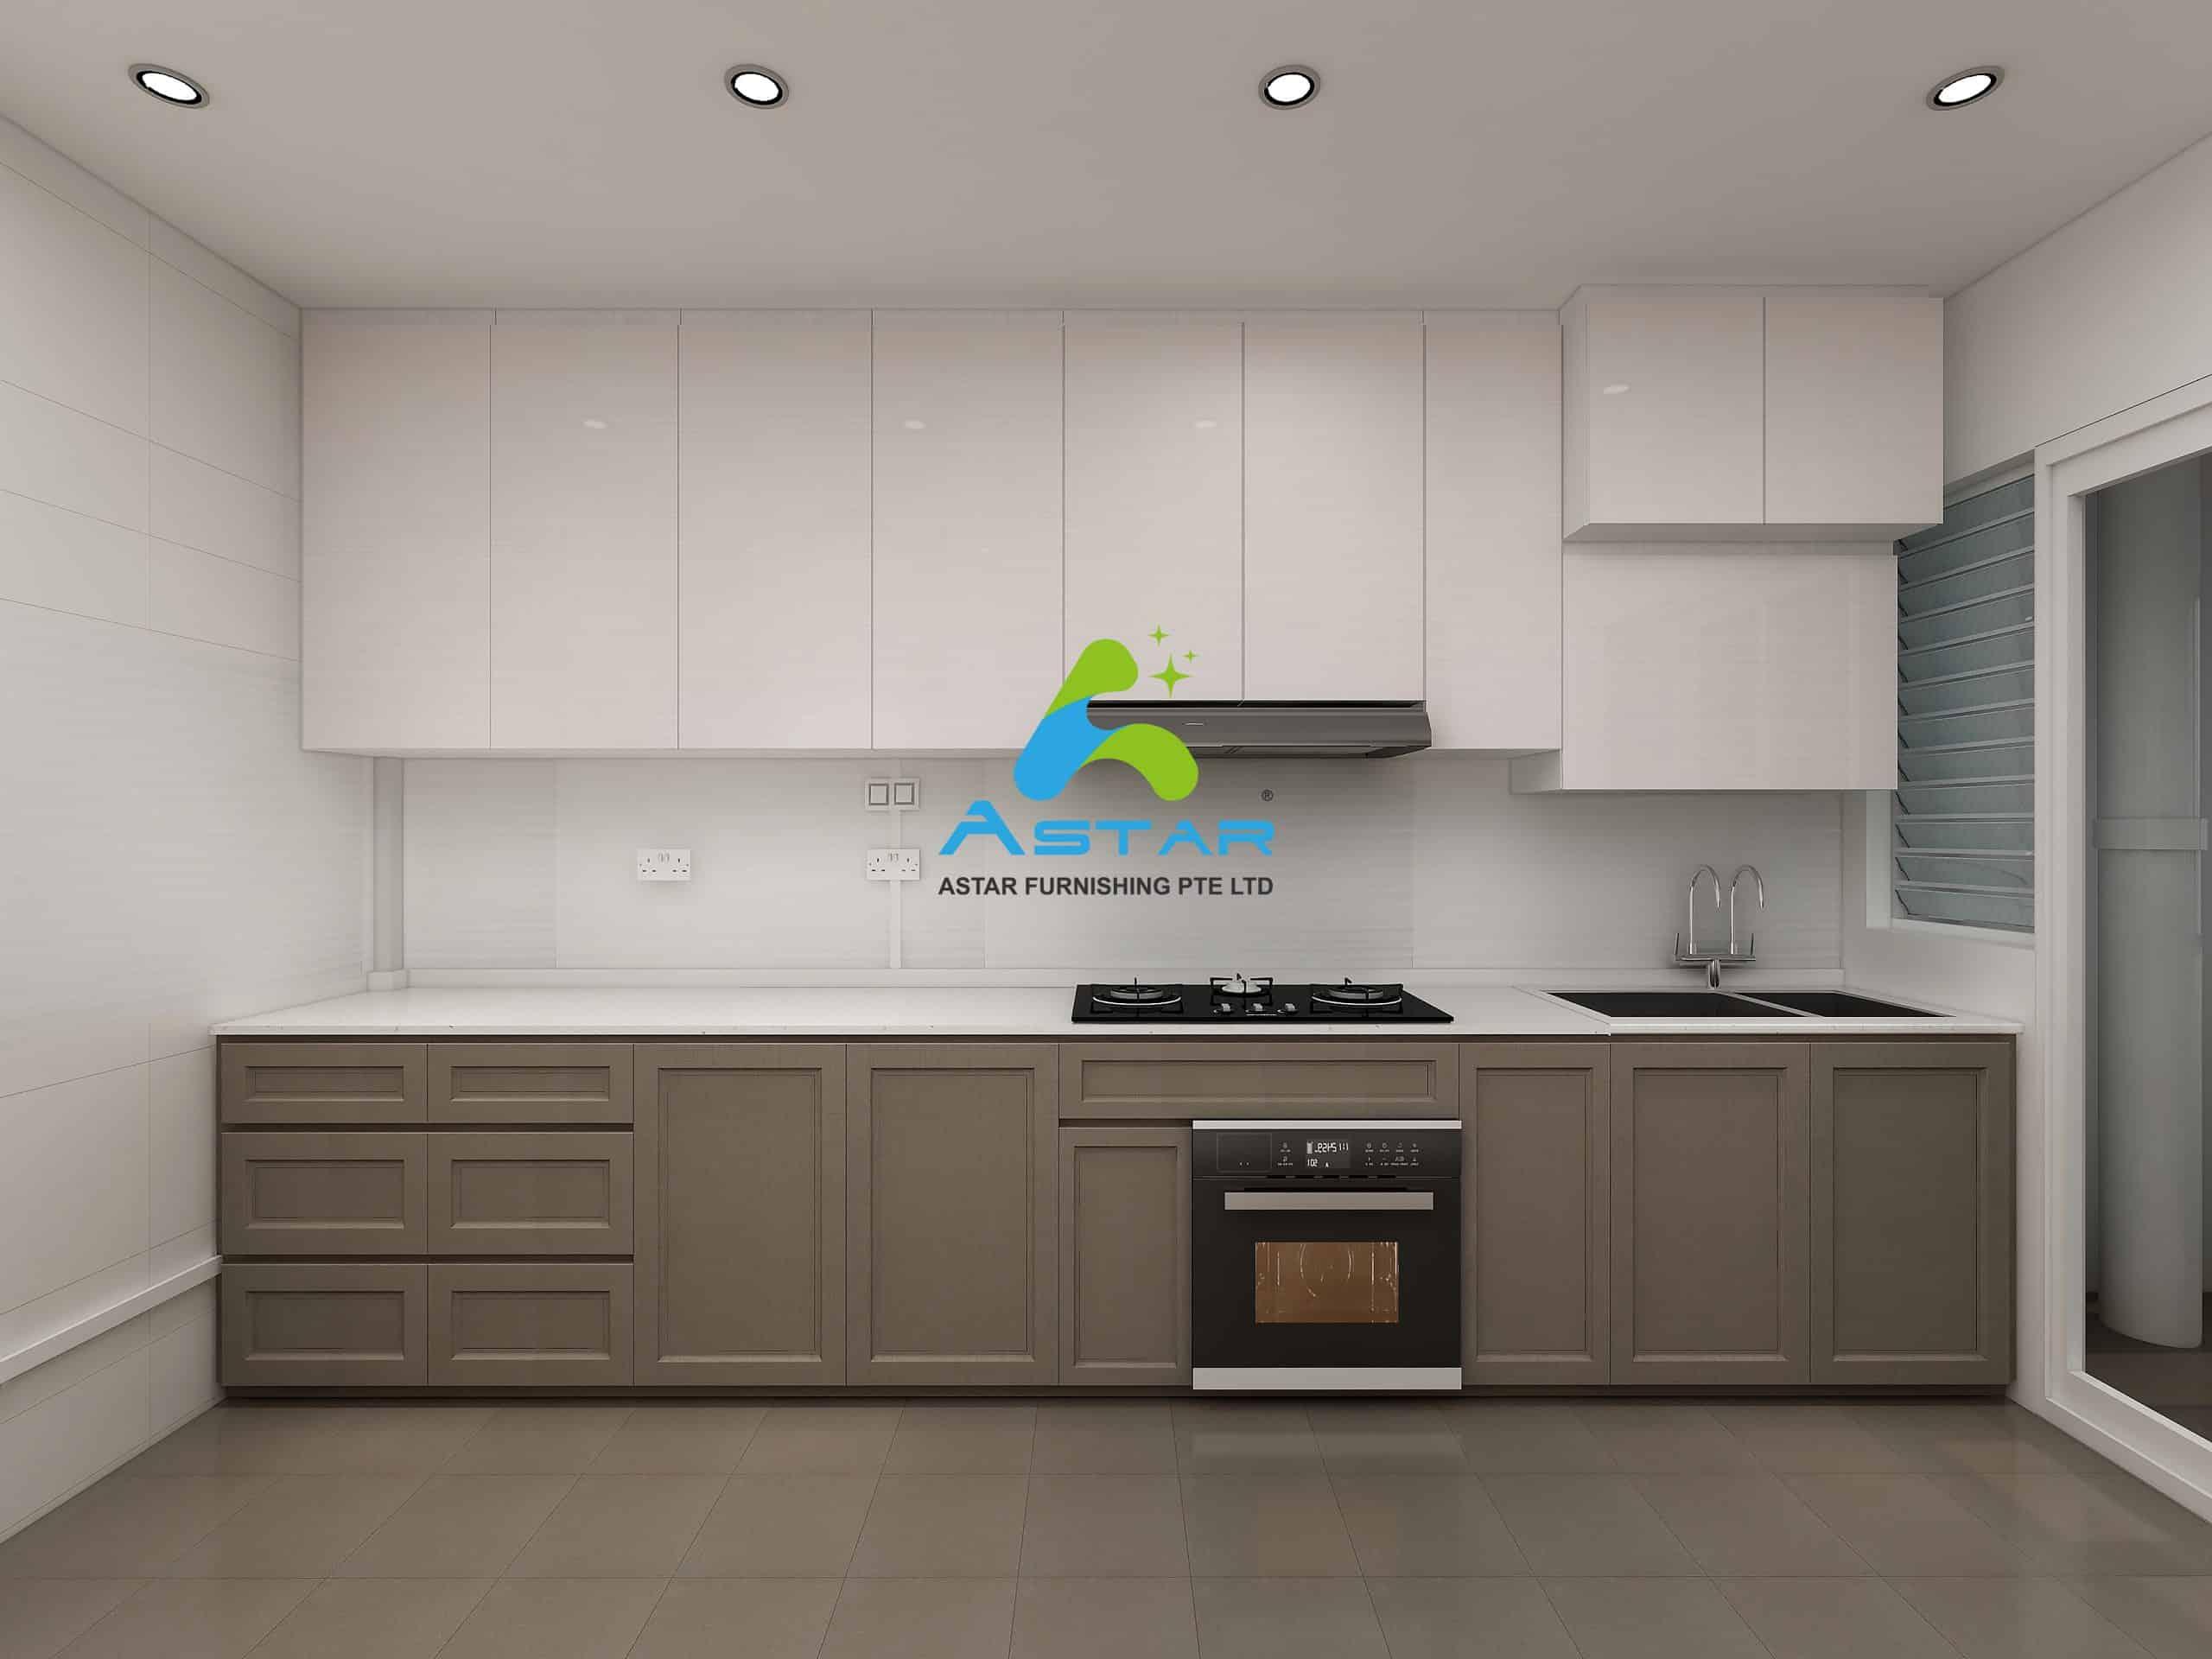 a star furnishing aluminium projects 12. Blk 325B Sumang Walk 057 scaled